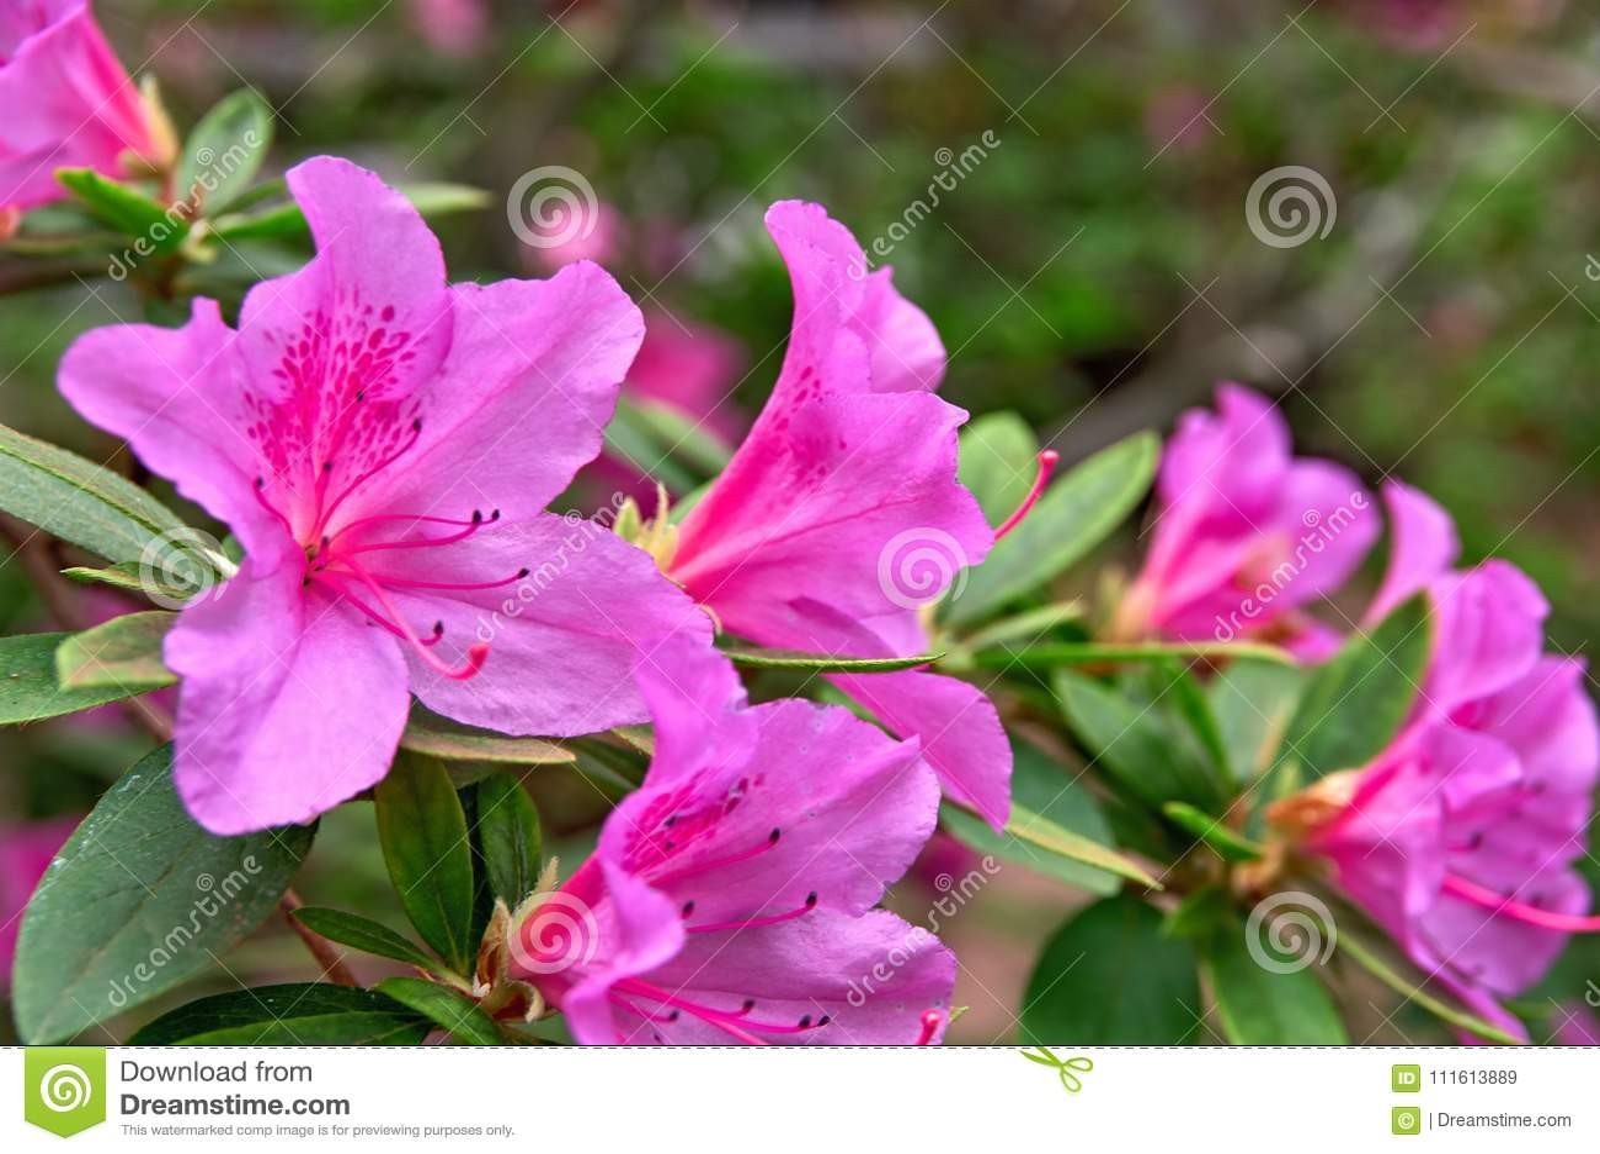 Azalée De Rose De Fleur De Ressort Jardin De Fleurs Au Printemps ...